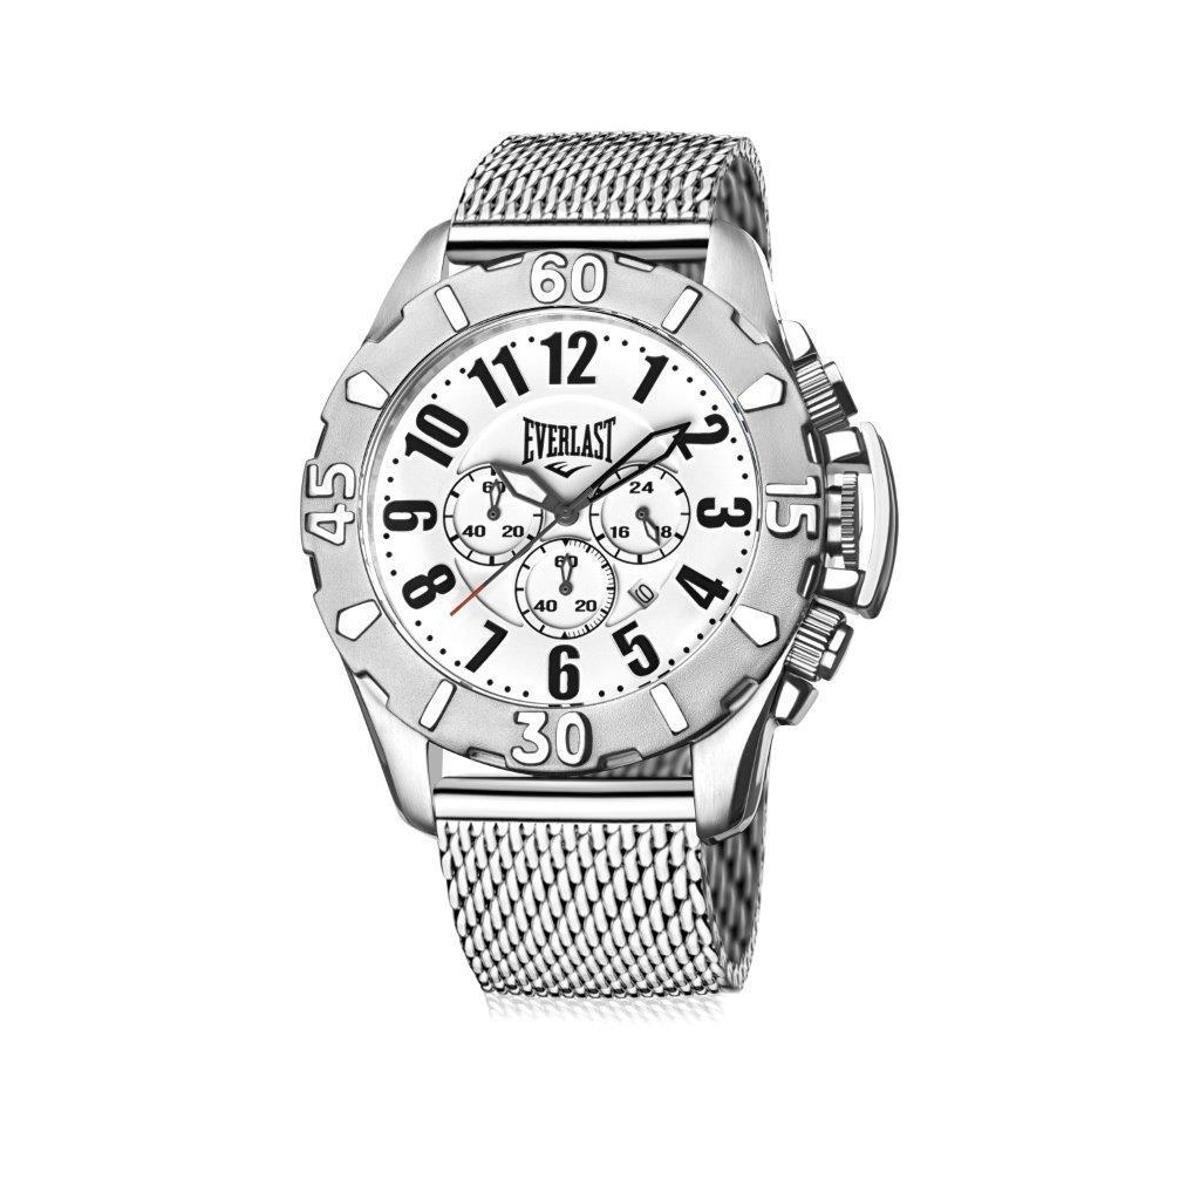 00e3a5c0e9d Relógio de Pulso Everlast Analógico Cx Pulseira Aço Silicone - Prata e  Branco - Compre Agora